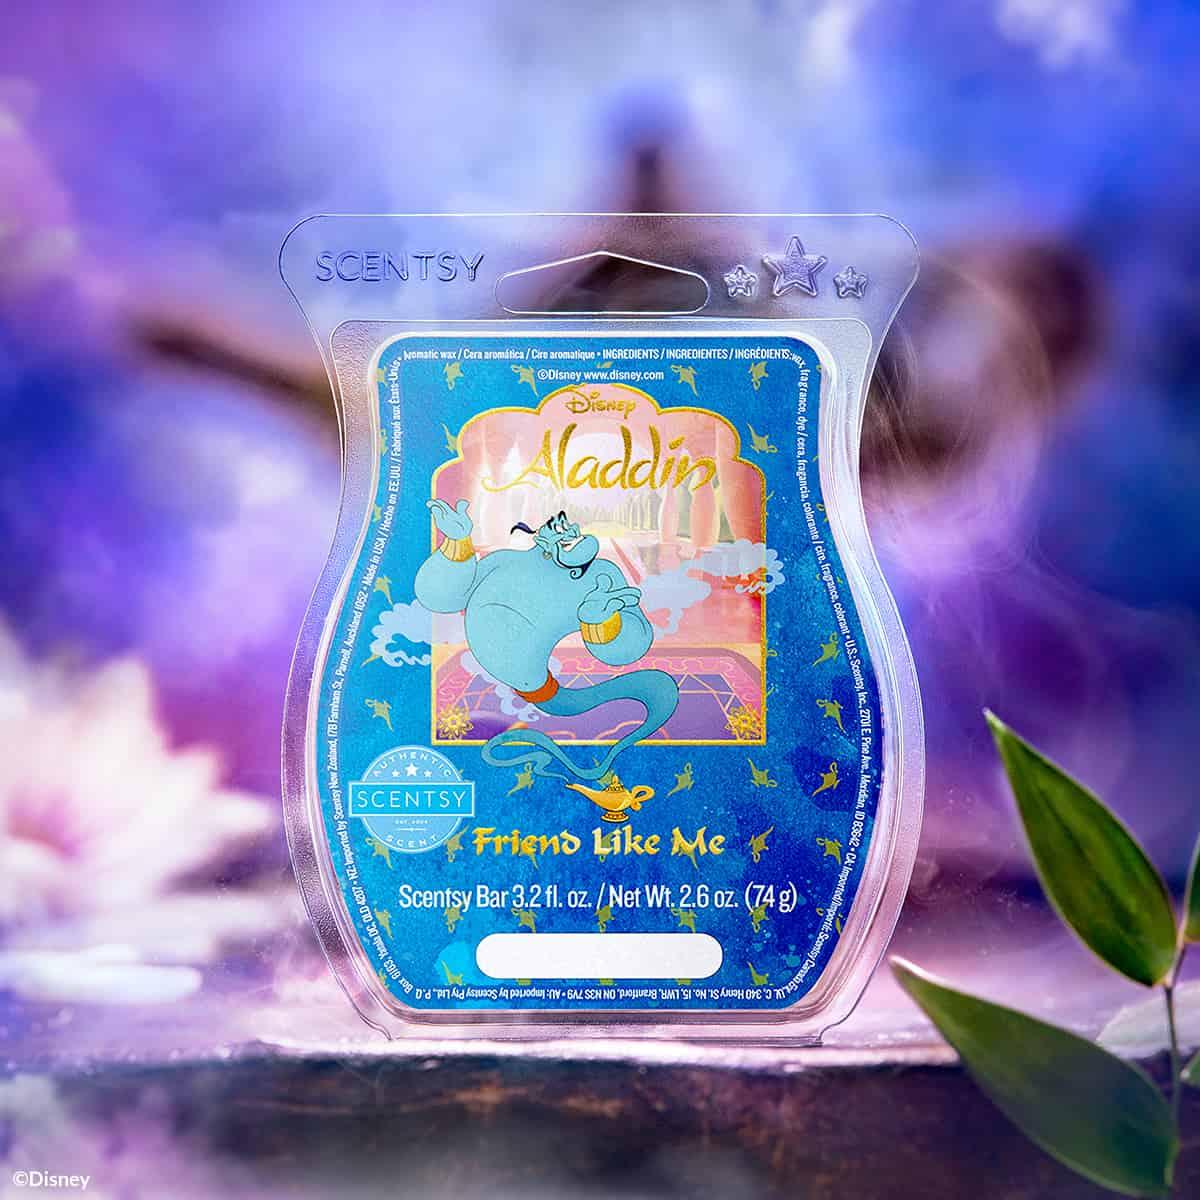 Disney Aladdin Wax Friend Like Me Online Scentsy Store